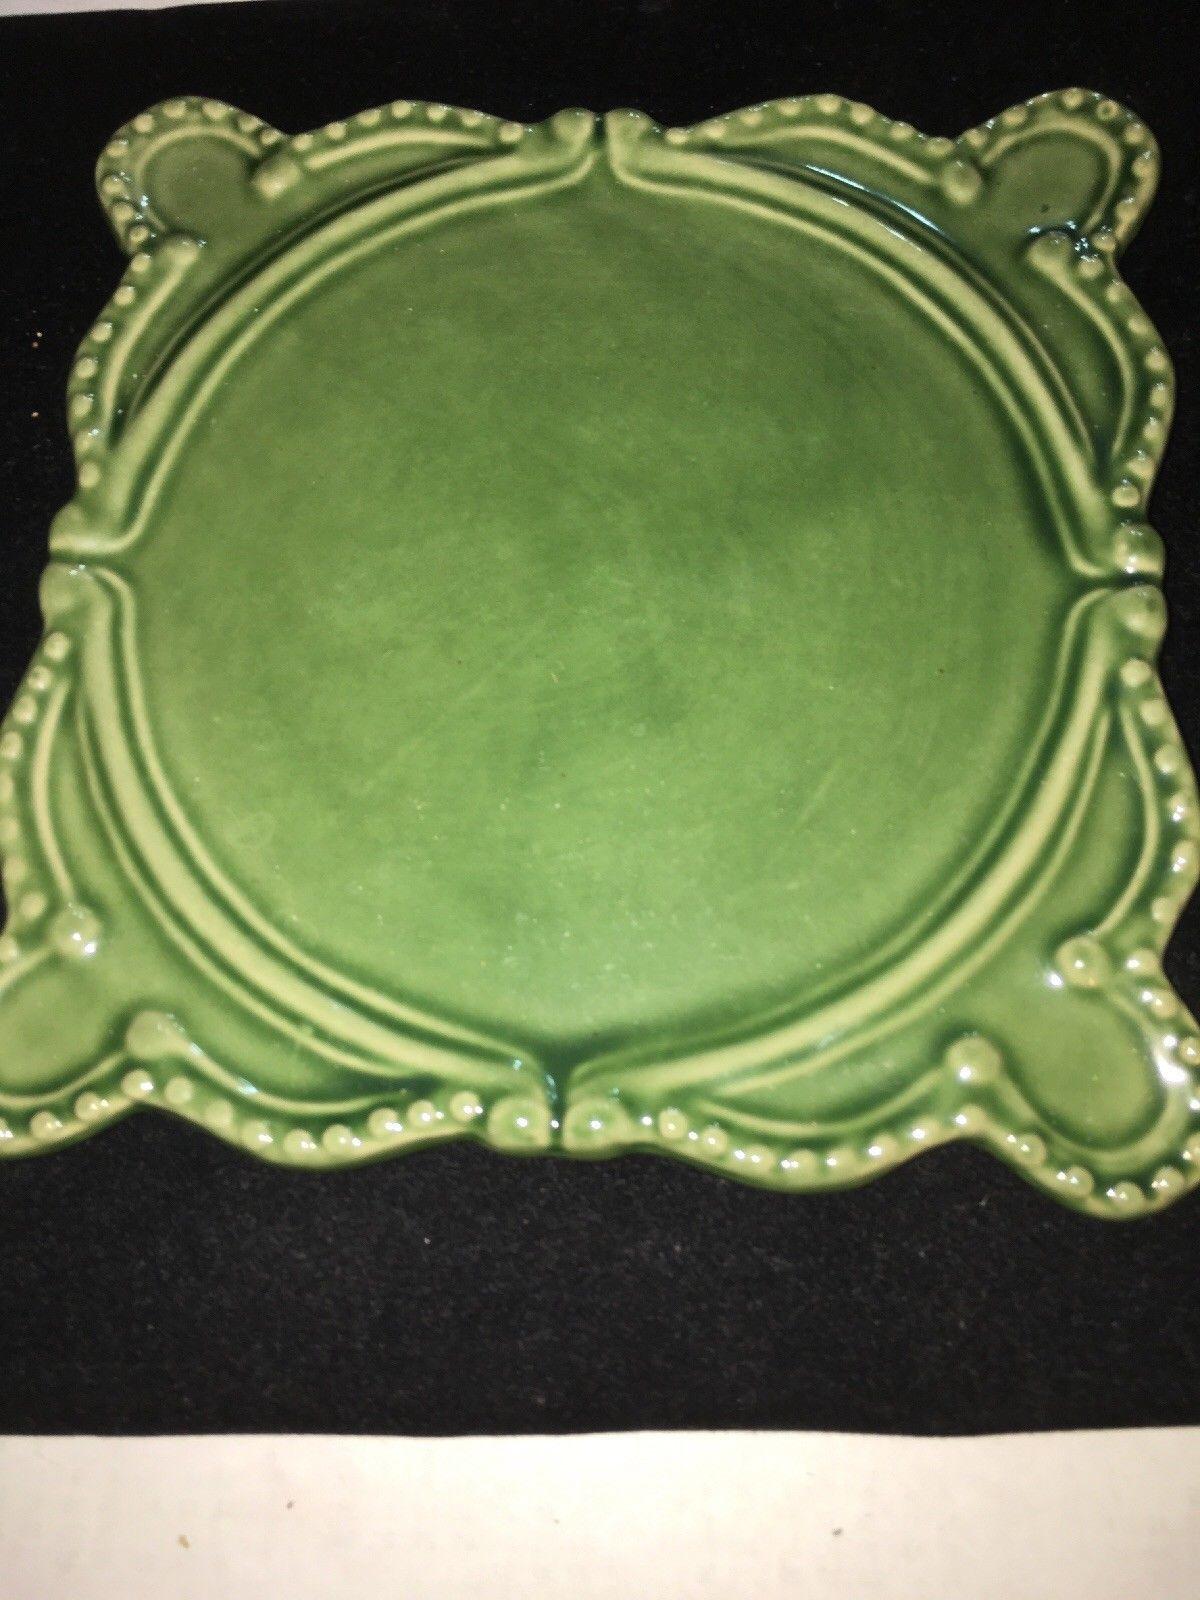 Classic Ceramics California Pantry 2005 and 50 similar items